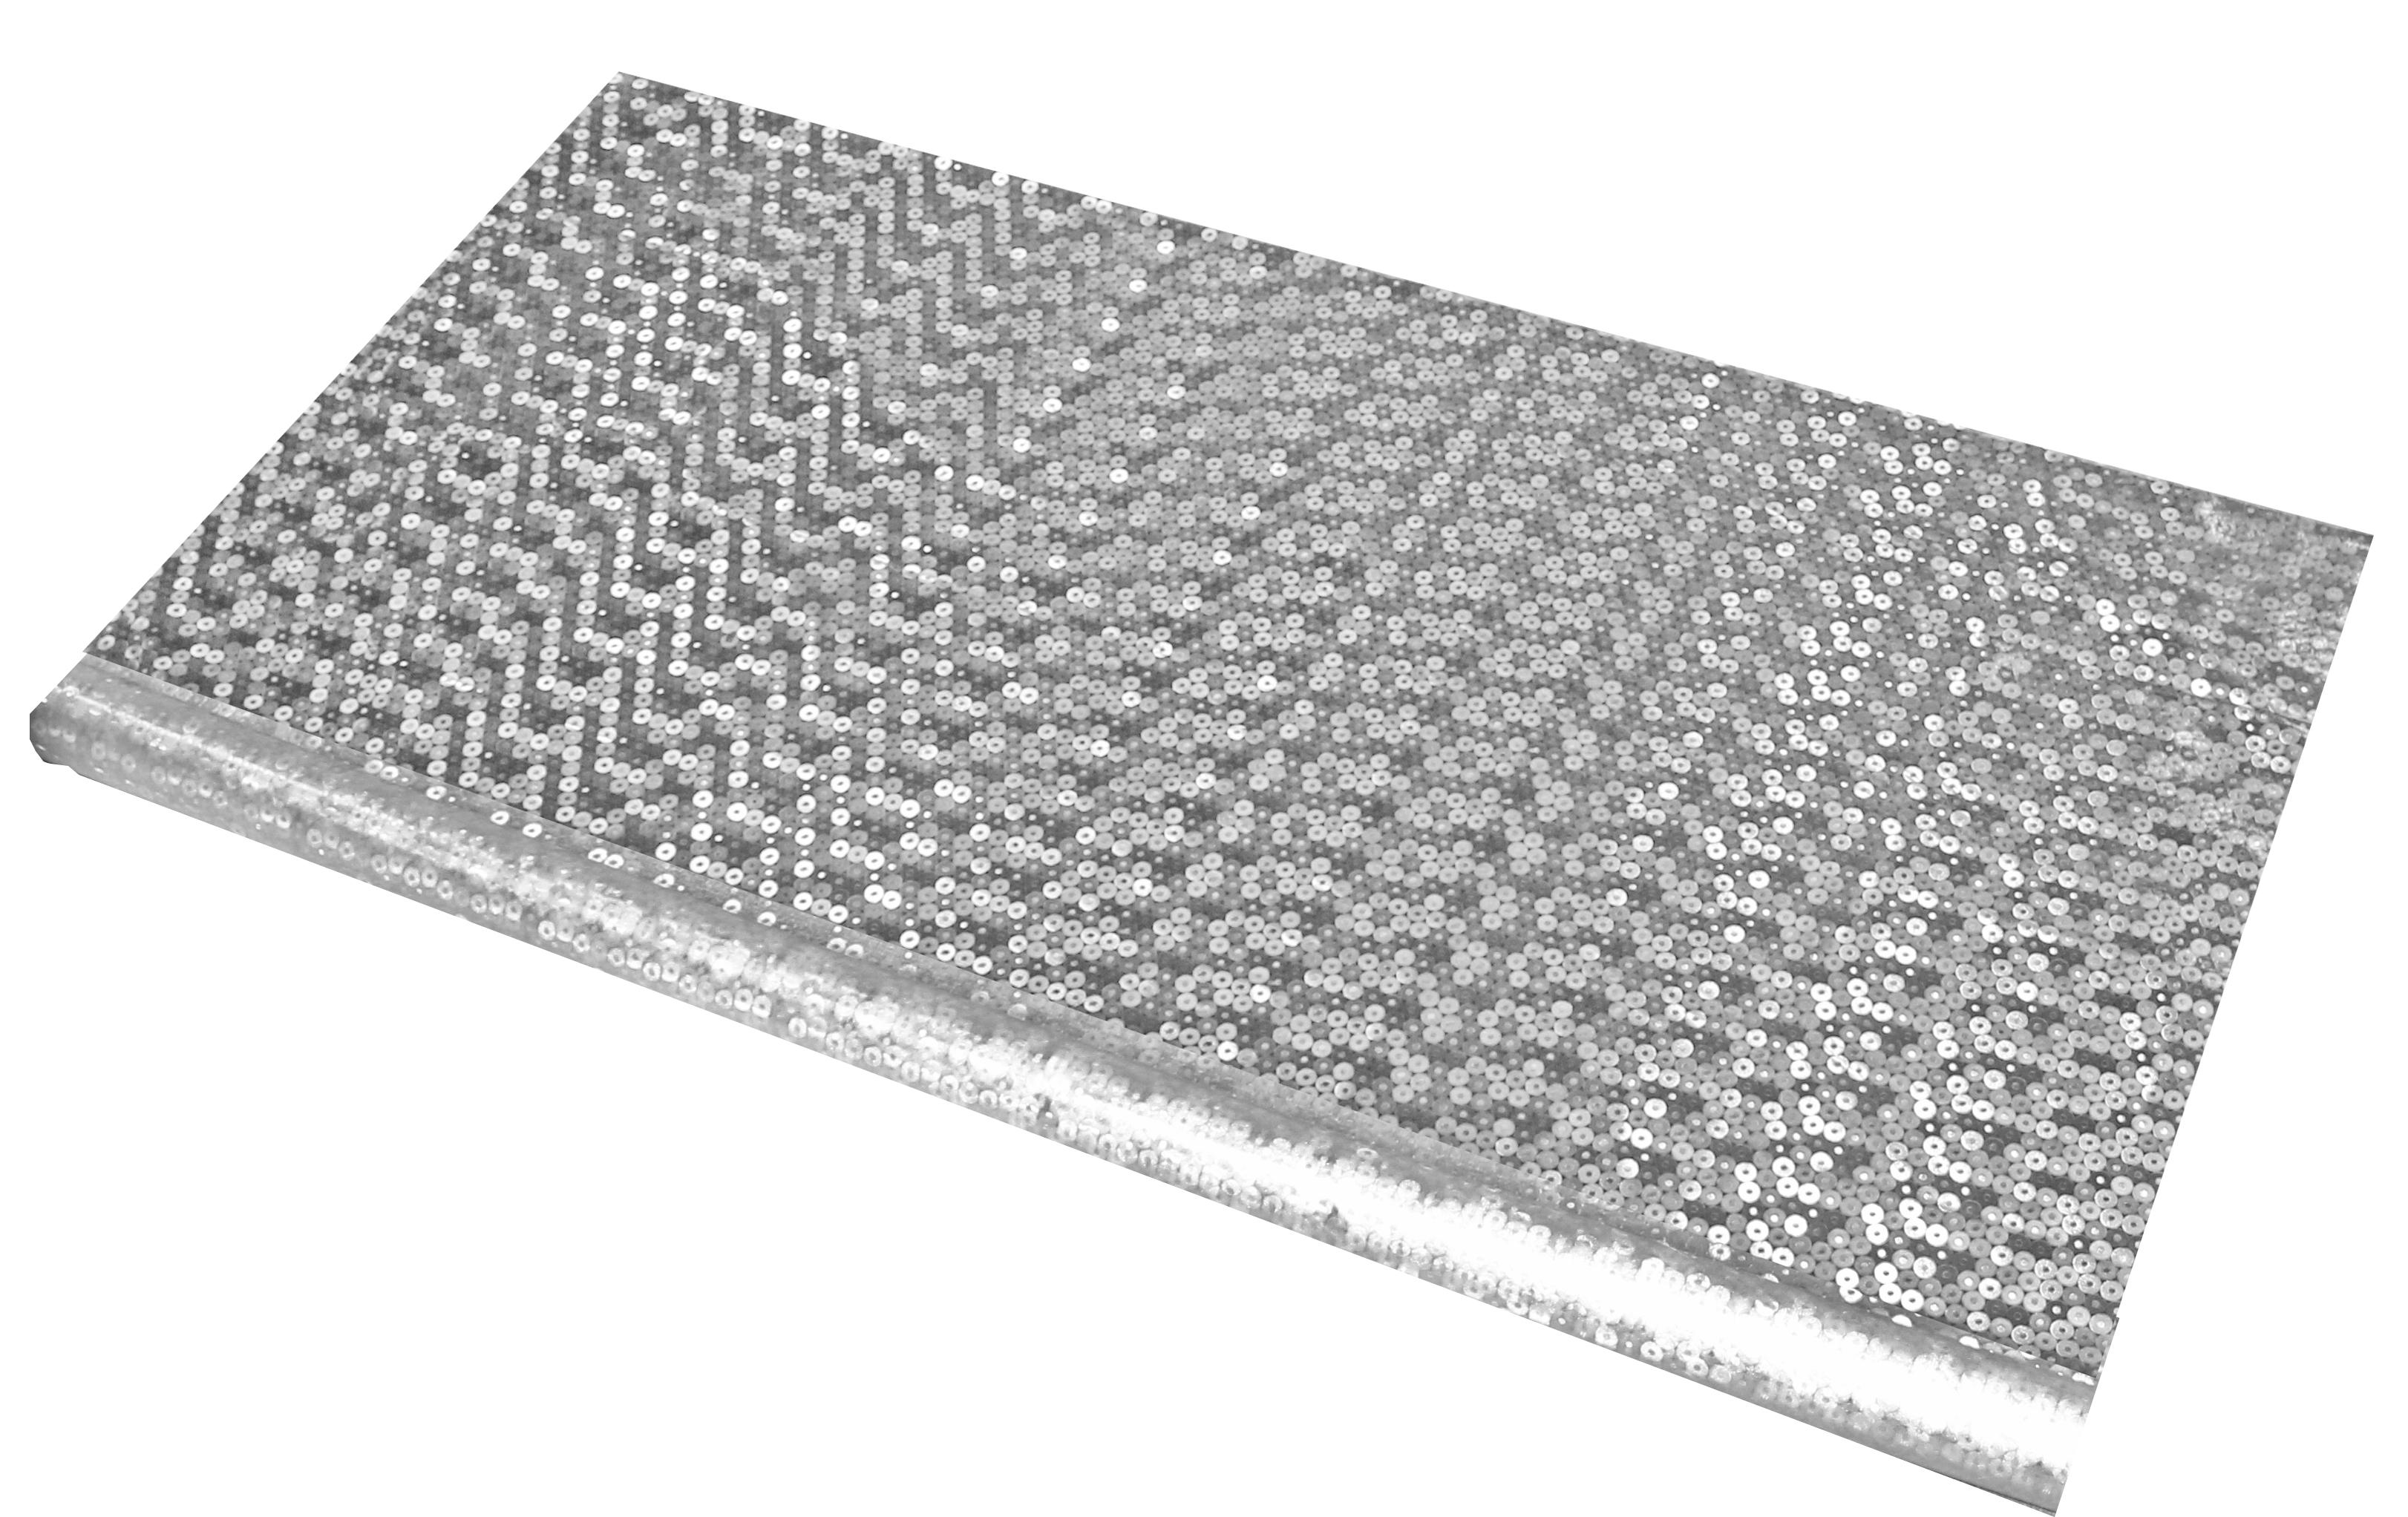 3D Crystal Emboss Pvc Tablecloth